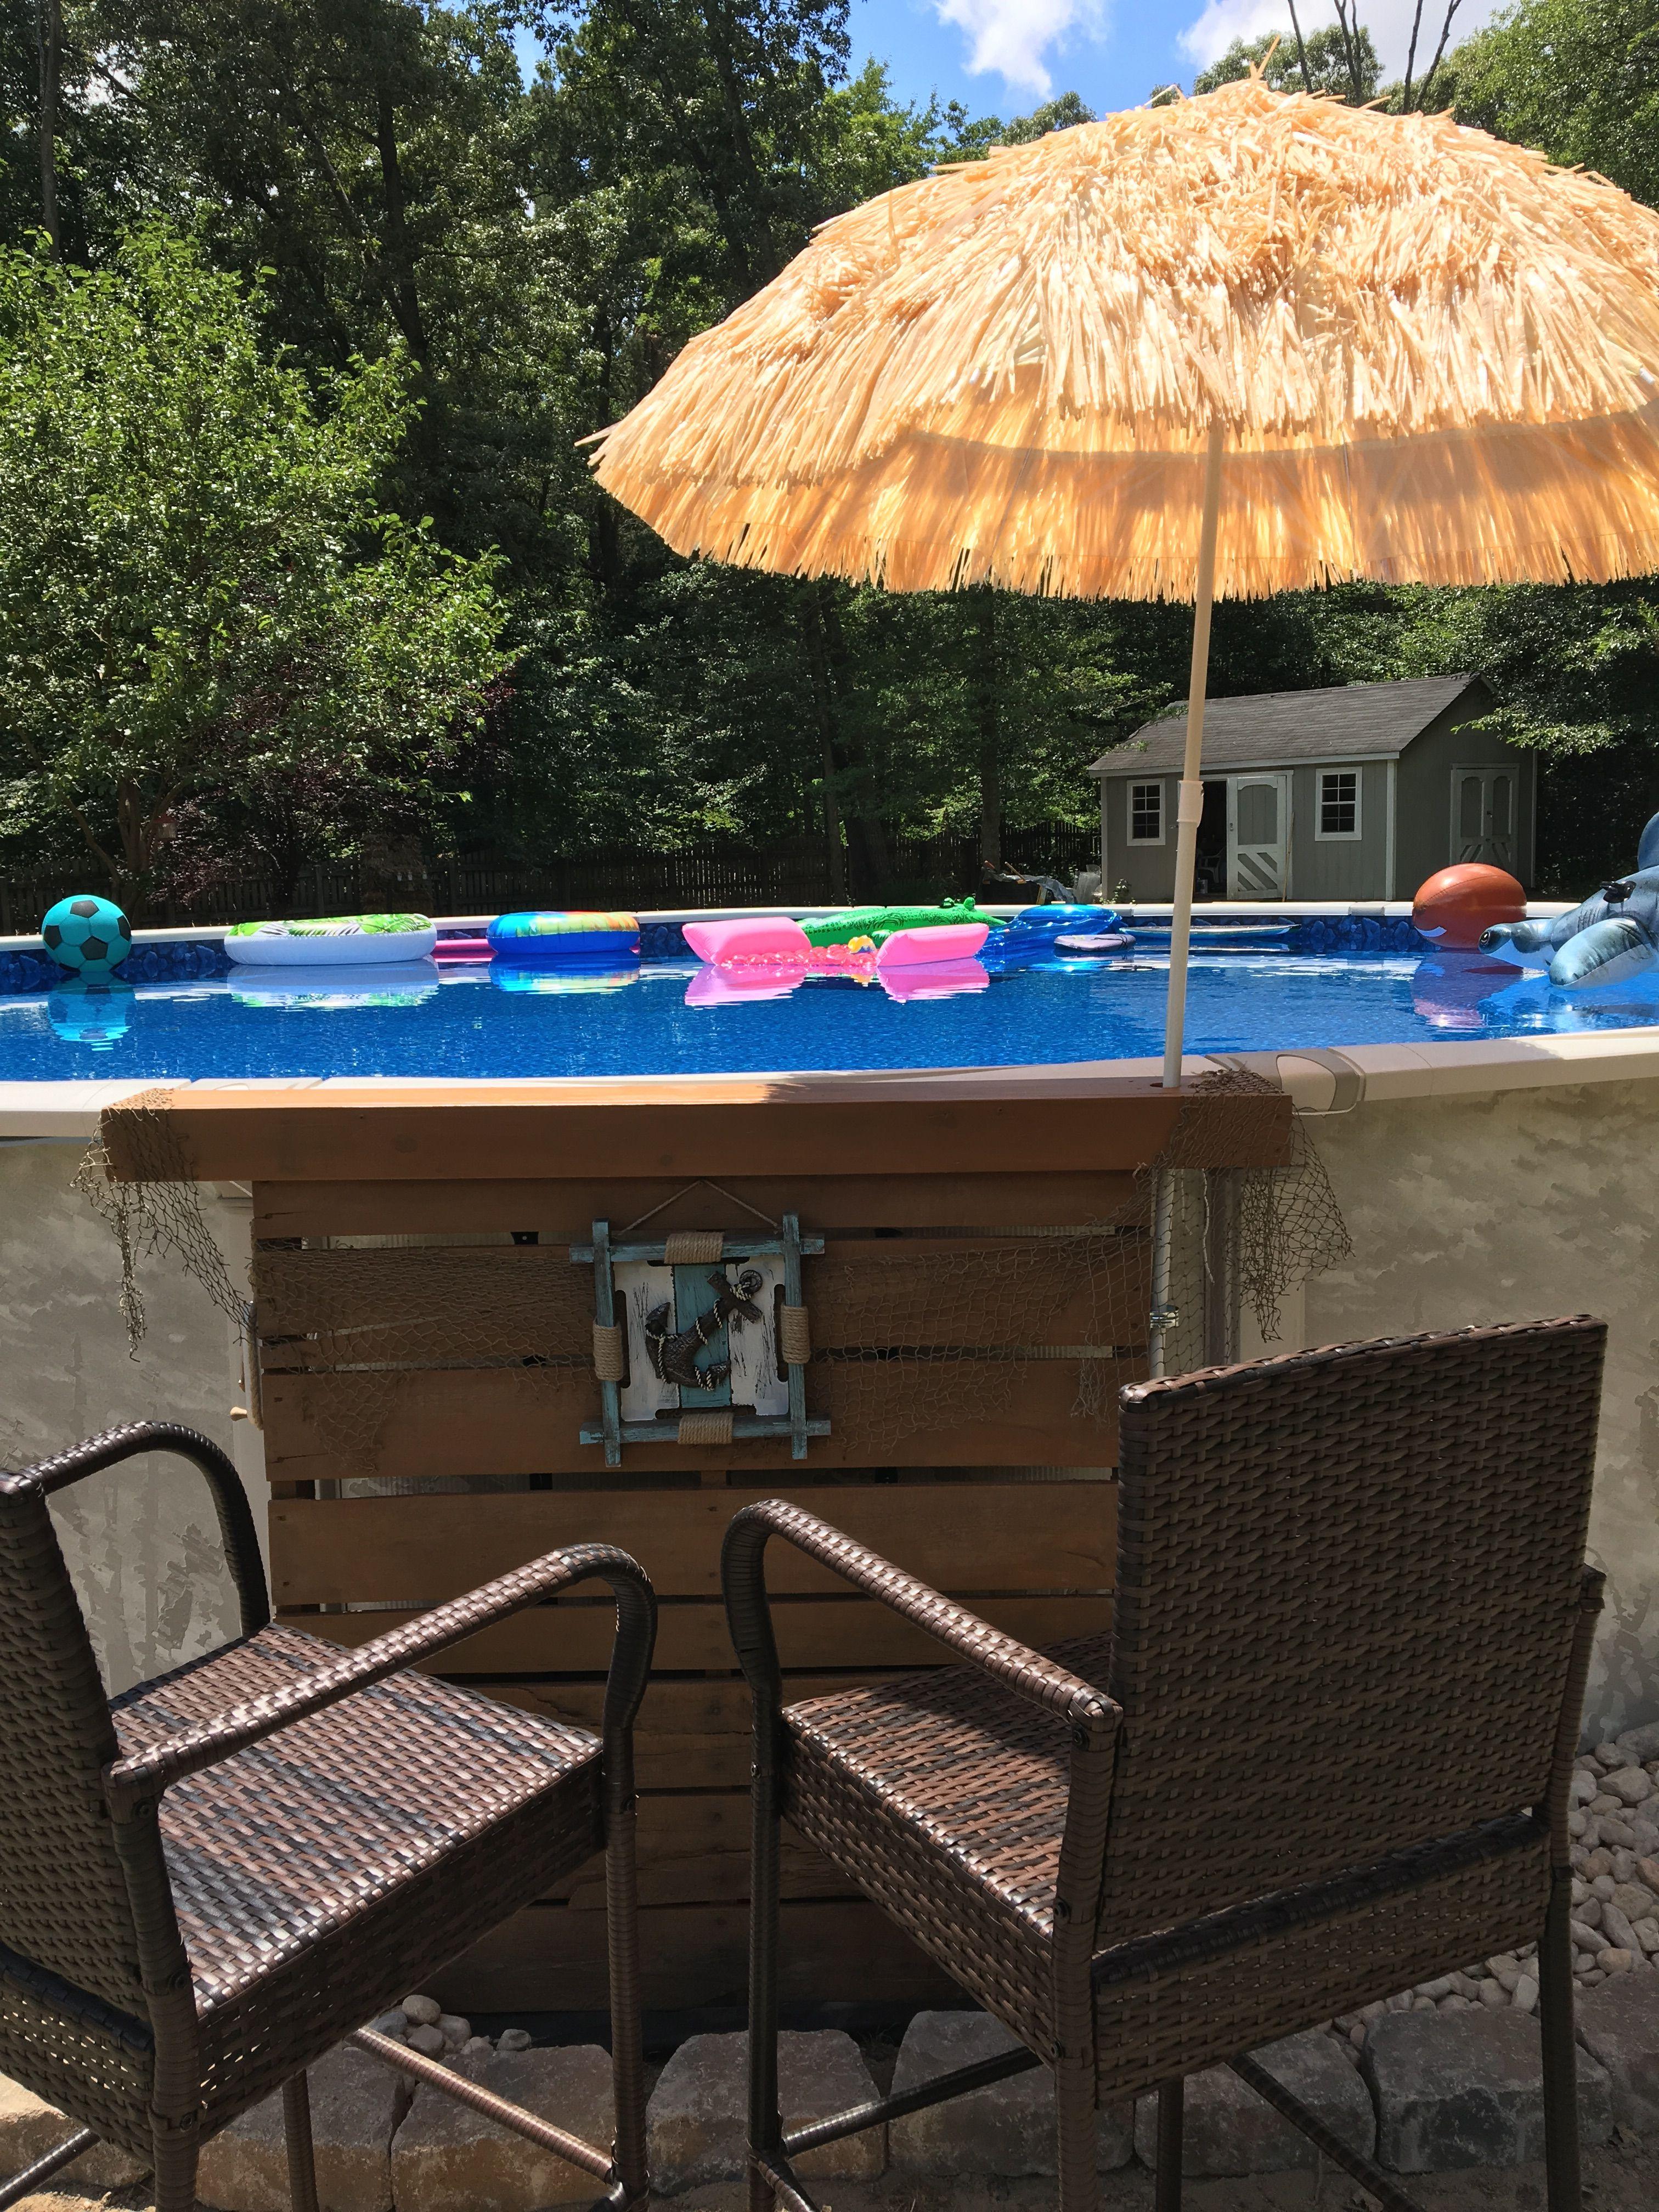 My Pallet Tiki Bar Pools Amp Pool Party In 2019 Pool Bar